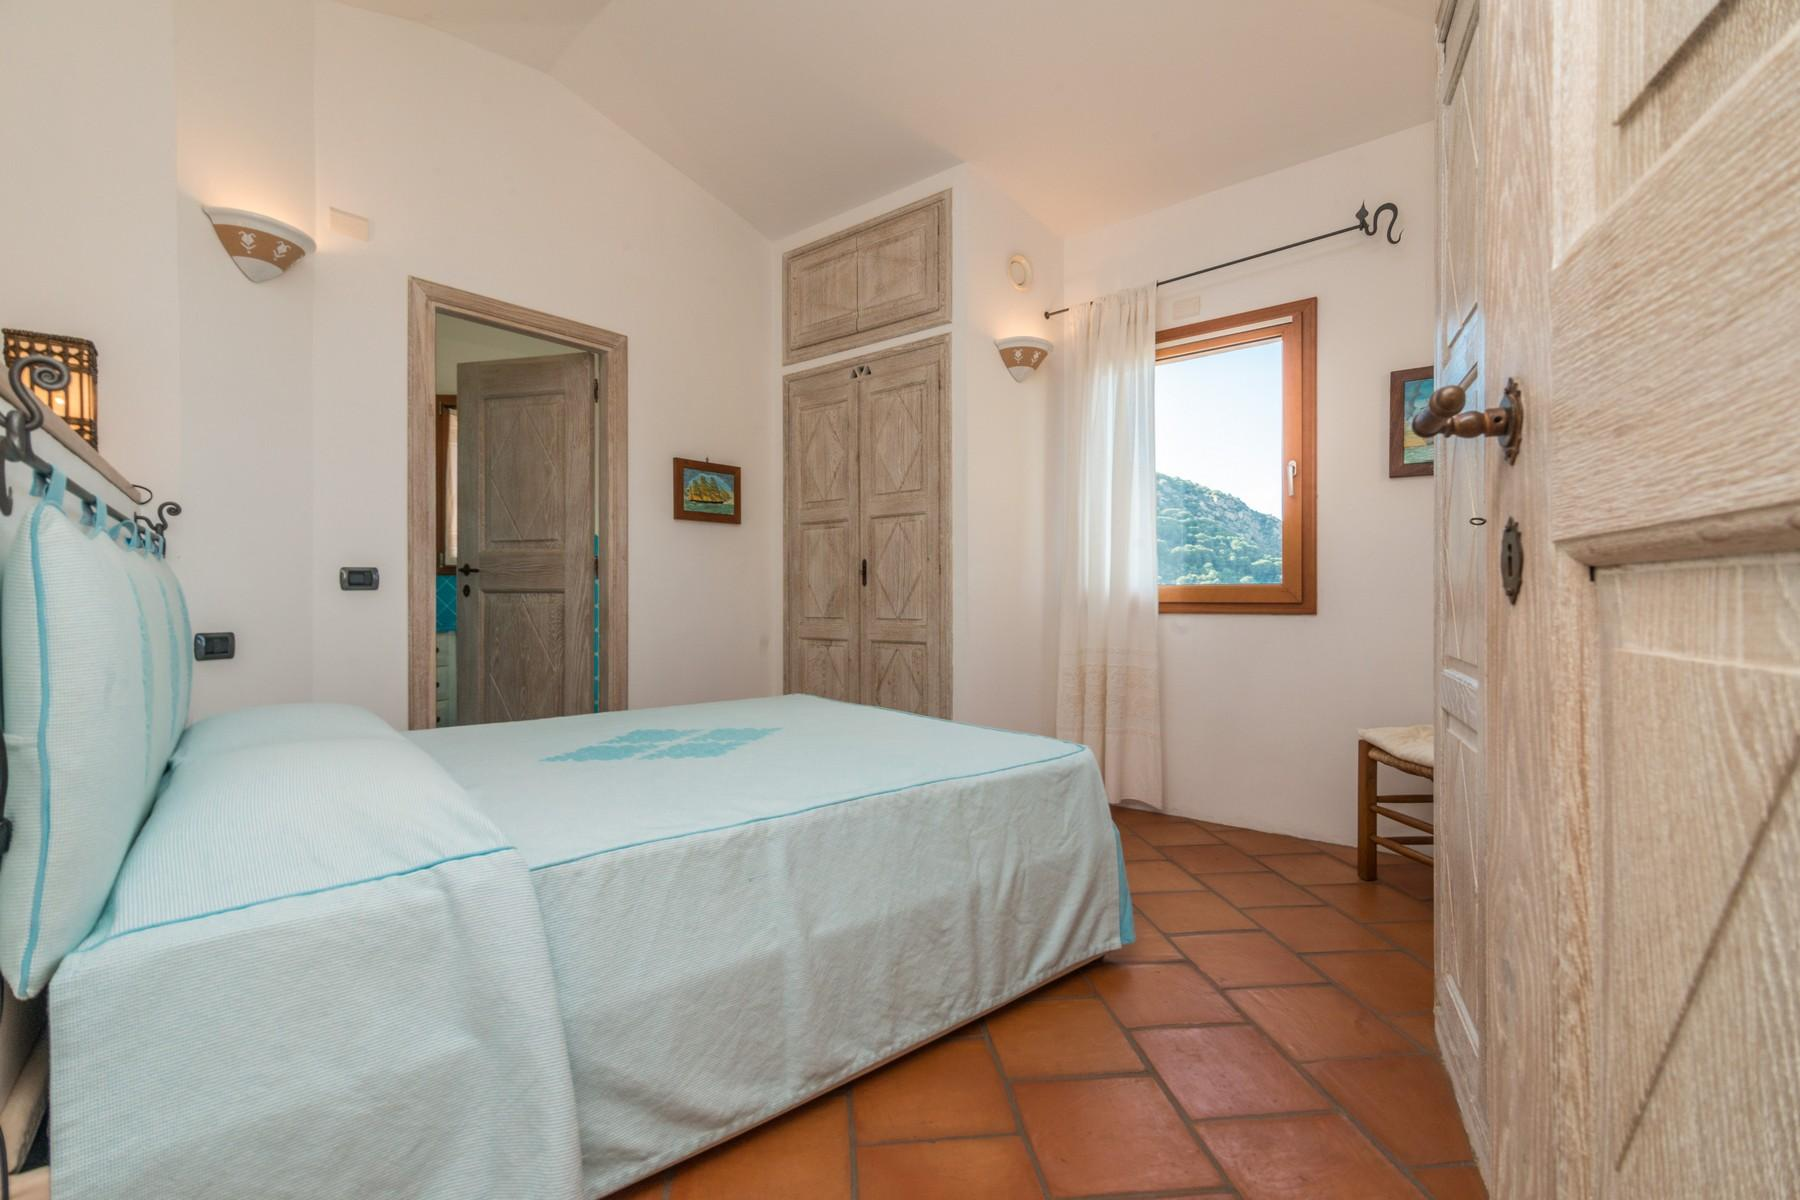 Porto Cervo Abbiadori Splendide villa jumelée avec vue sur le golfe de Pevero - 24